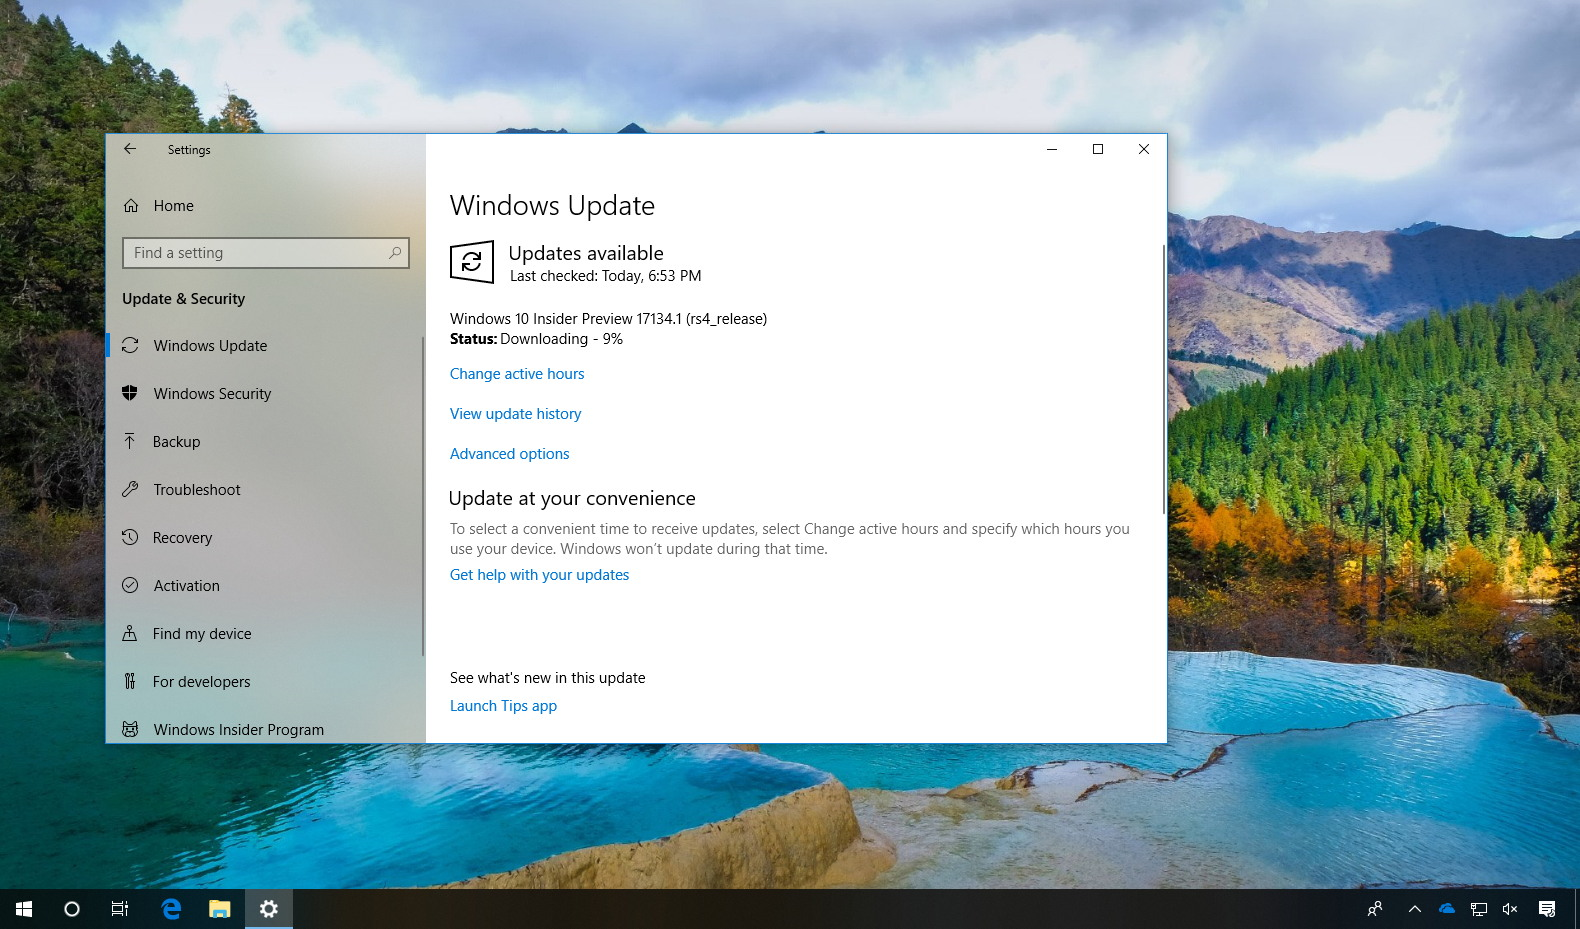 Windows 10 build 17134